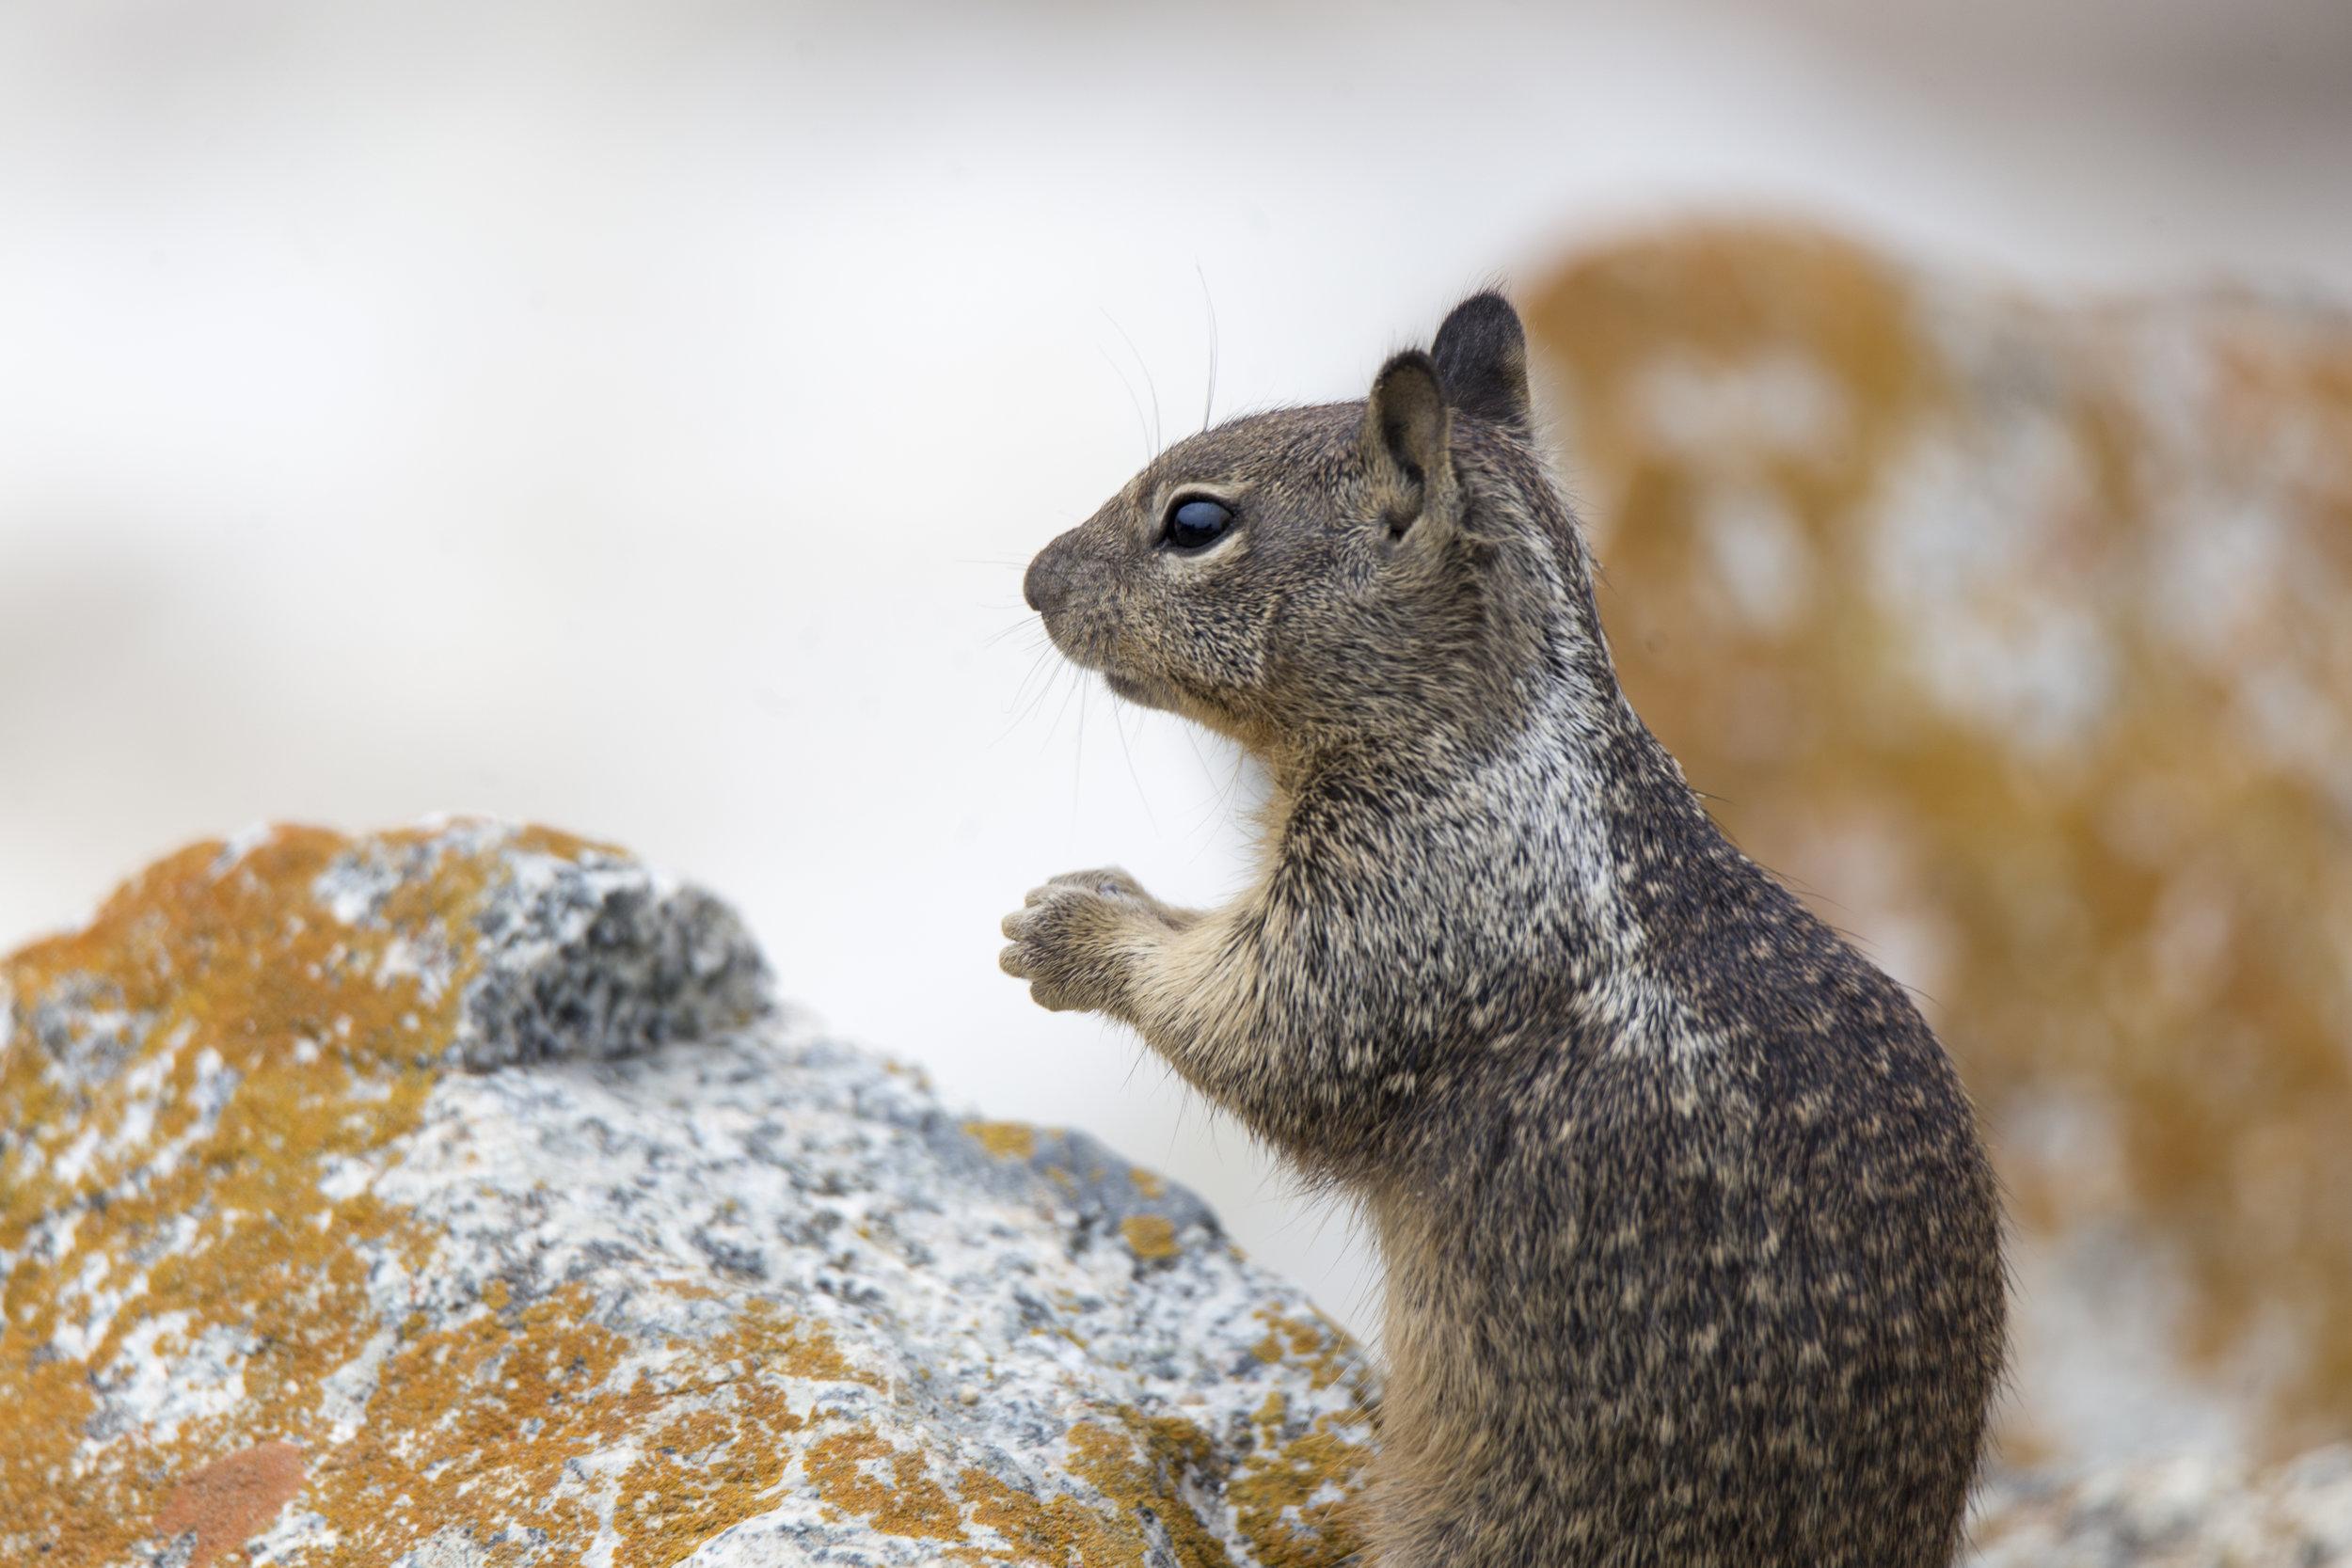 17miledrive_squirrel1.jpg